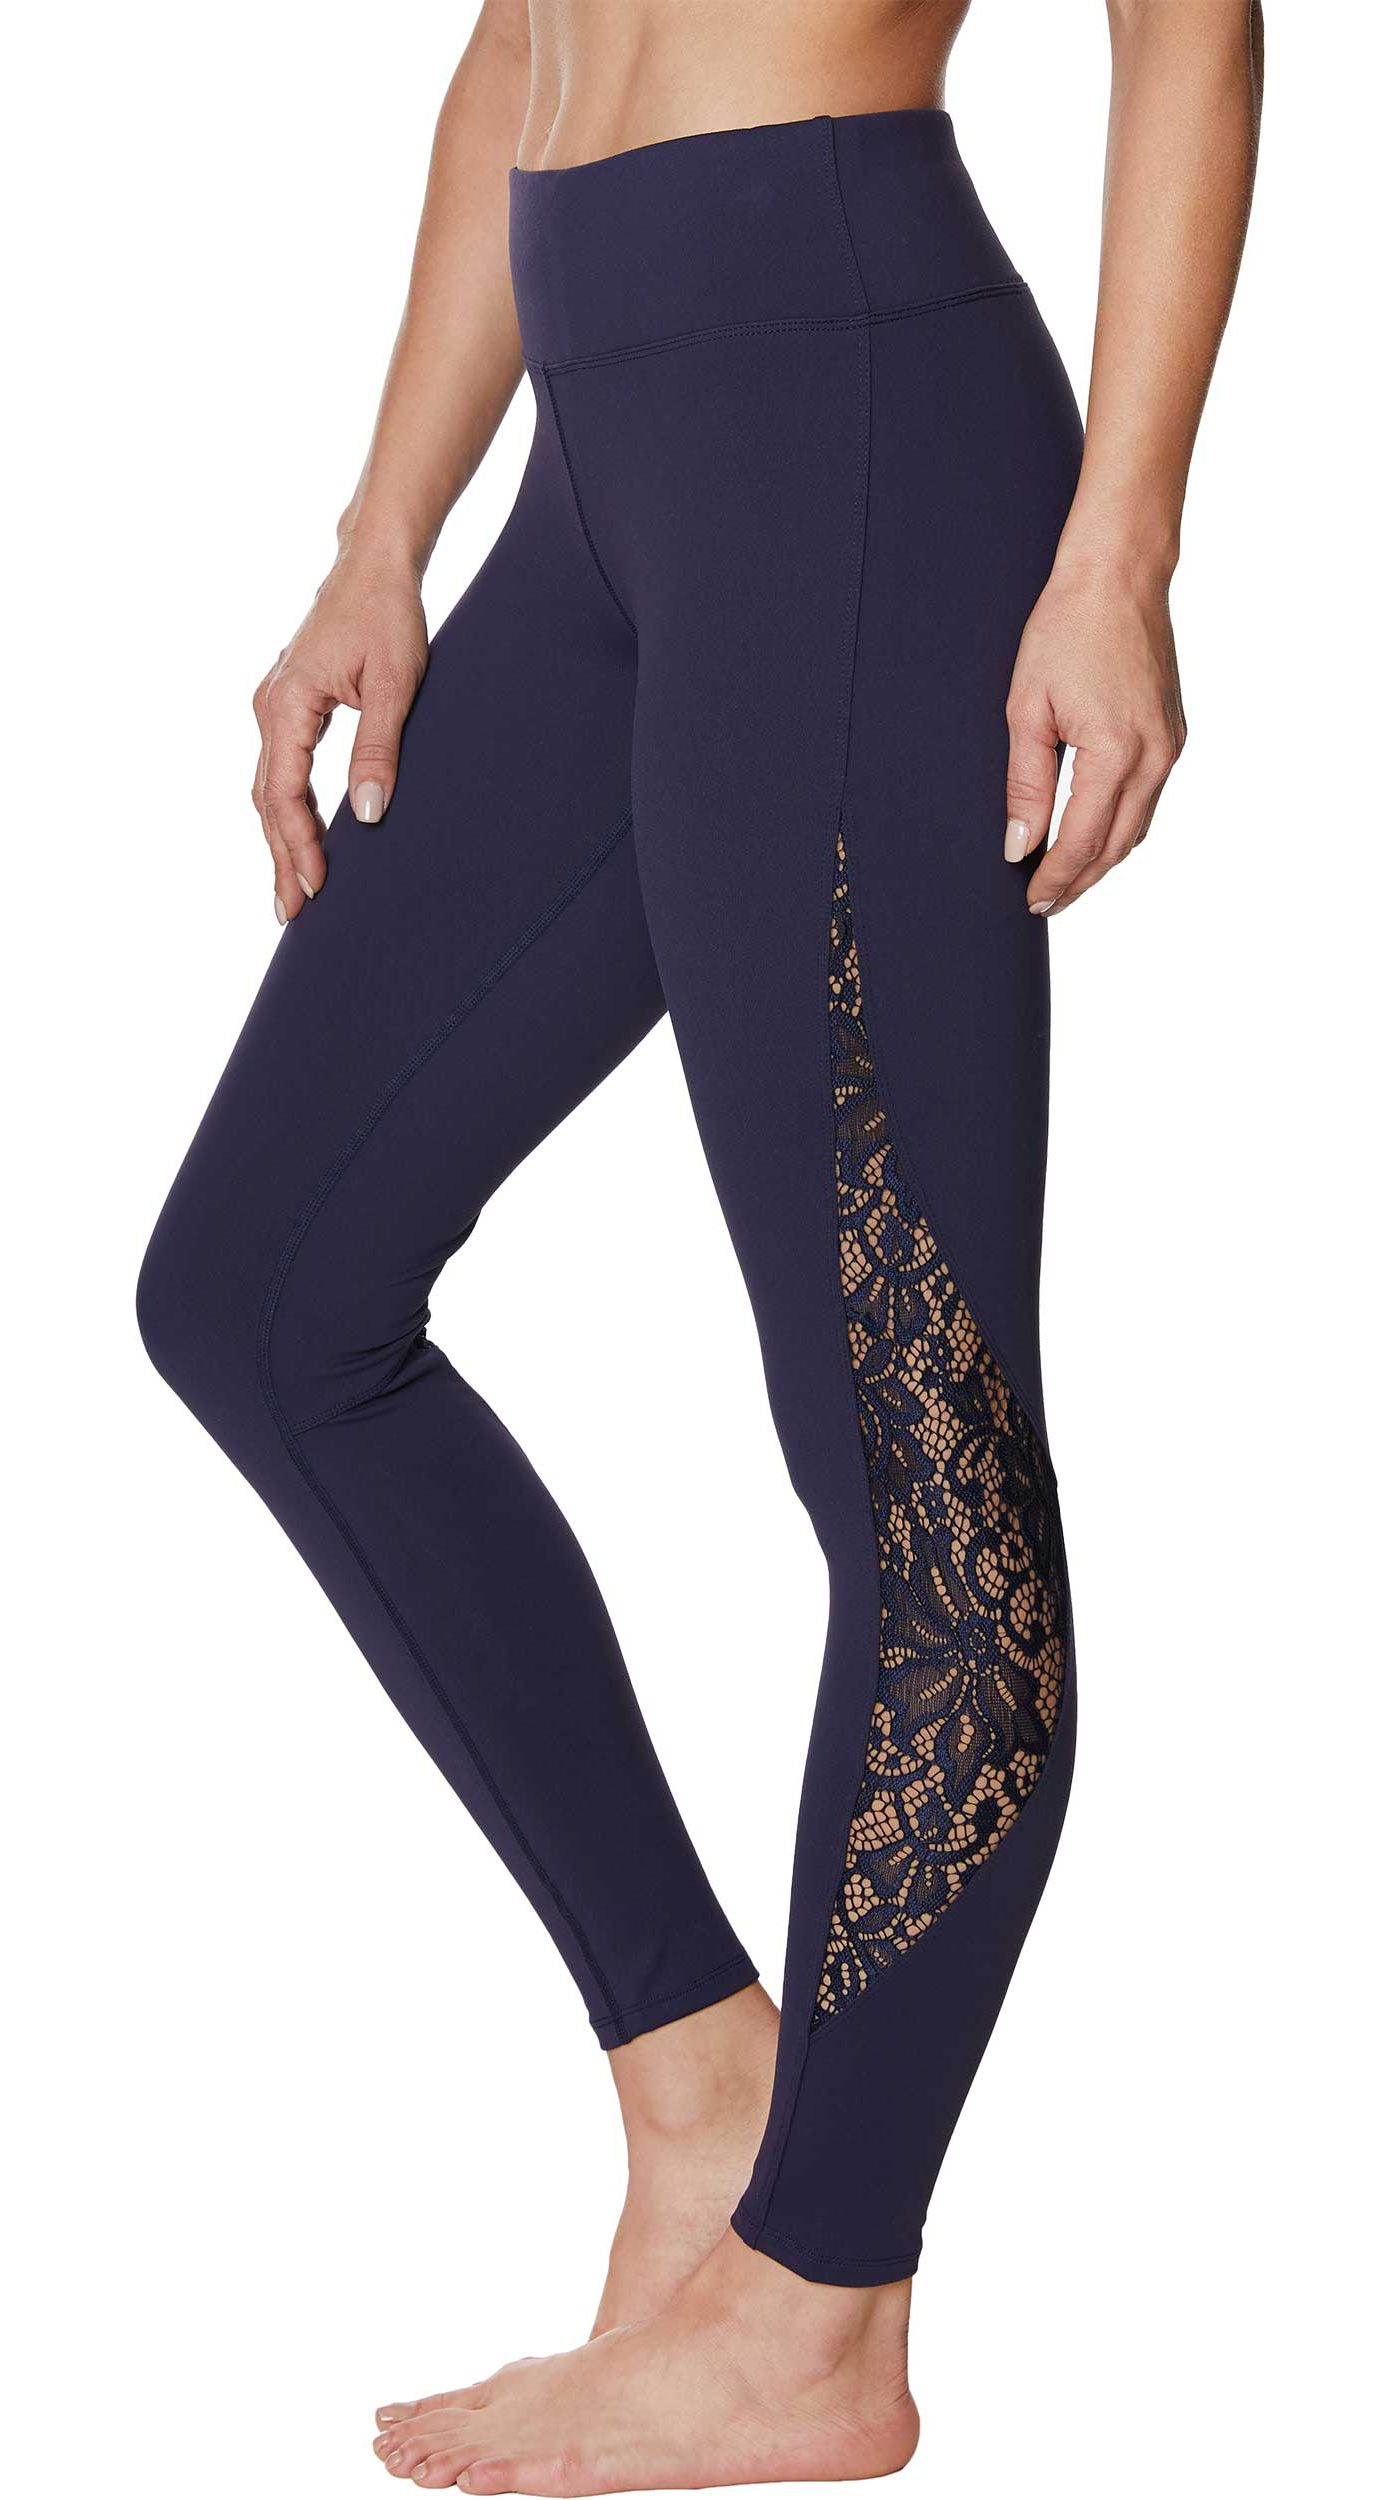 Betsey Johnson Women's Lace Mesh Ankle Leggings